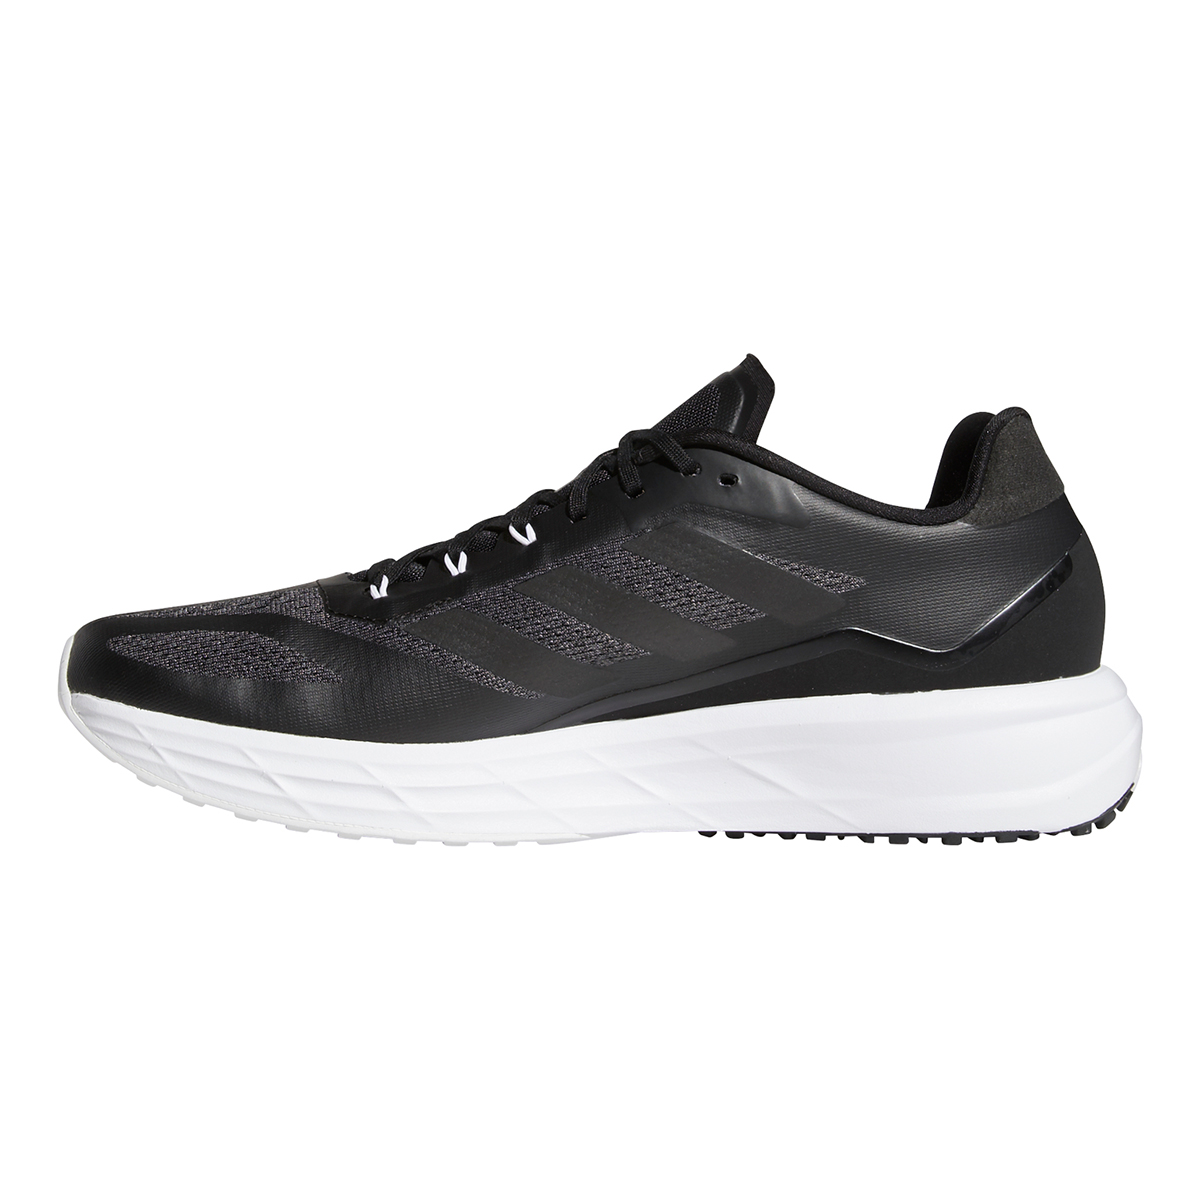 Men's Adidas SL20.2 Running Shoe - Color: Core Black/Grey - Size: 6.5 - Width: Regular, Core Black/Grey, large, image 2